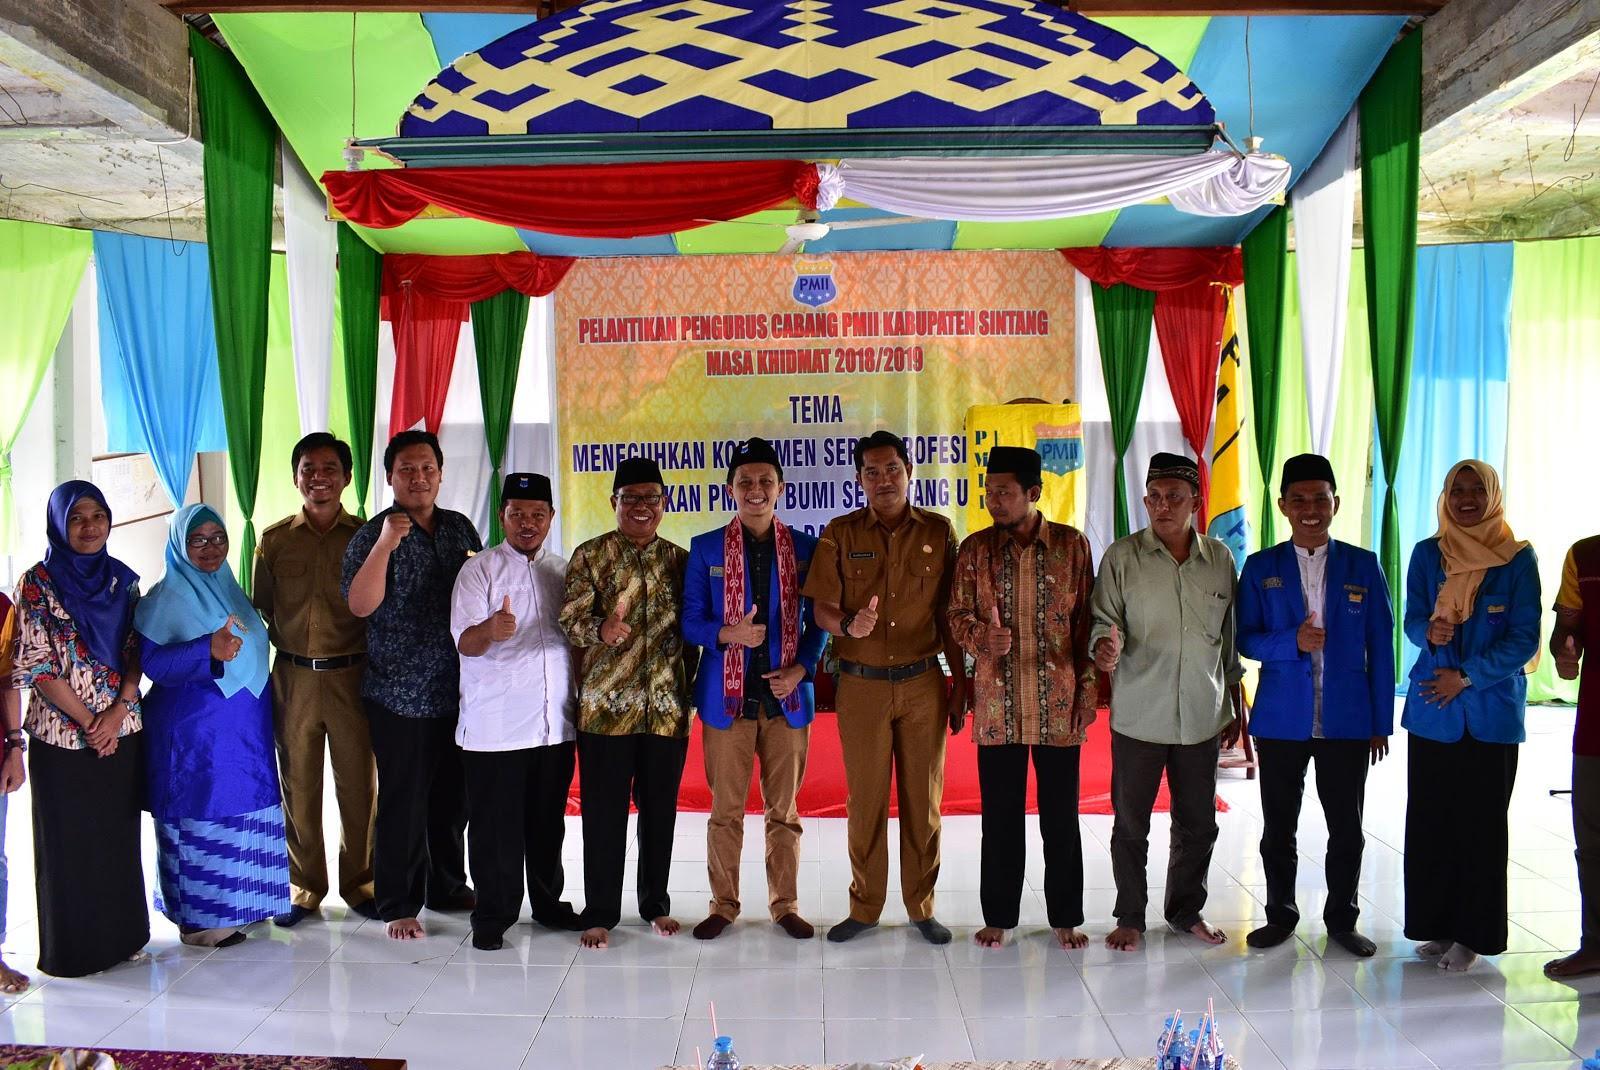 Pelantikan Pengurus Cabang PMII Kabupaten Sintang Masa Khitmad 2018 – 2019